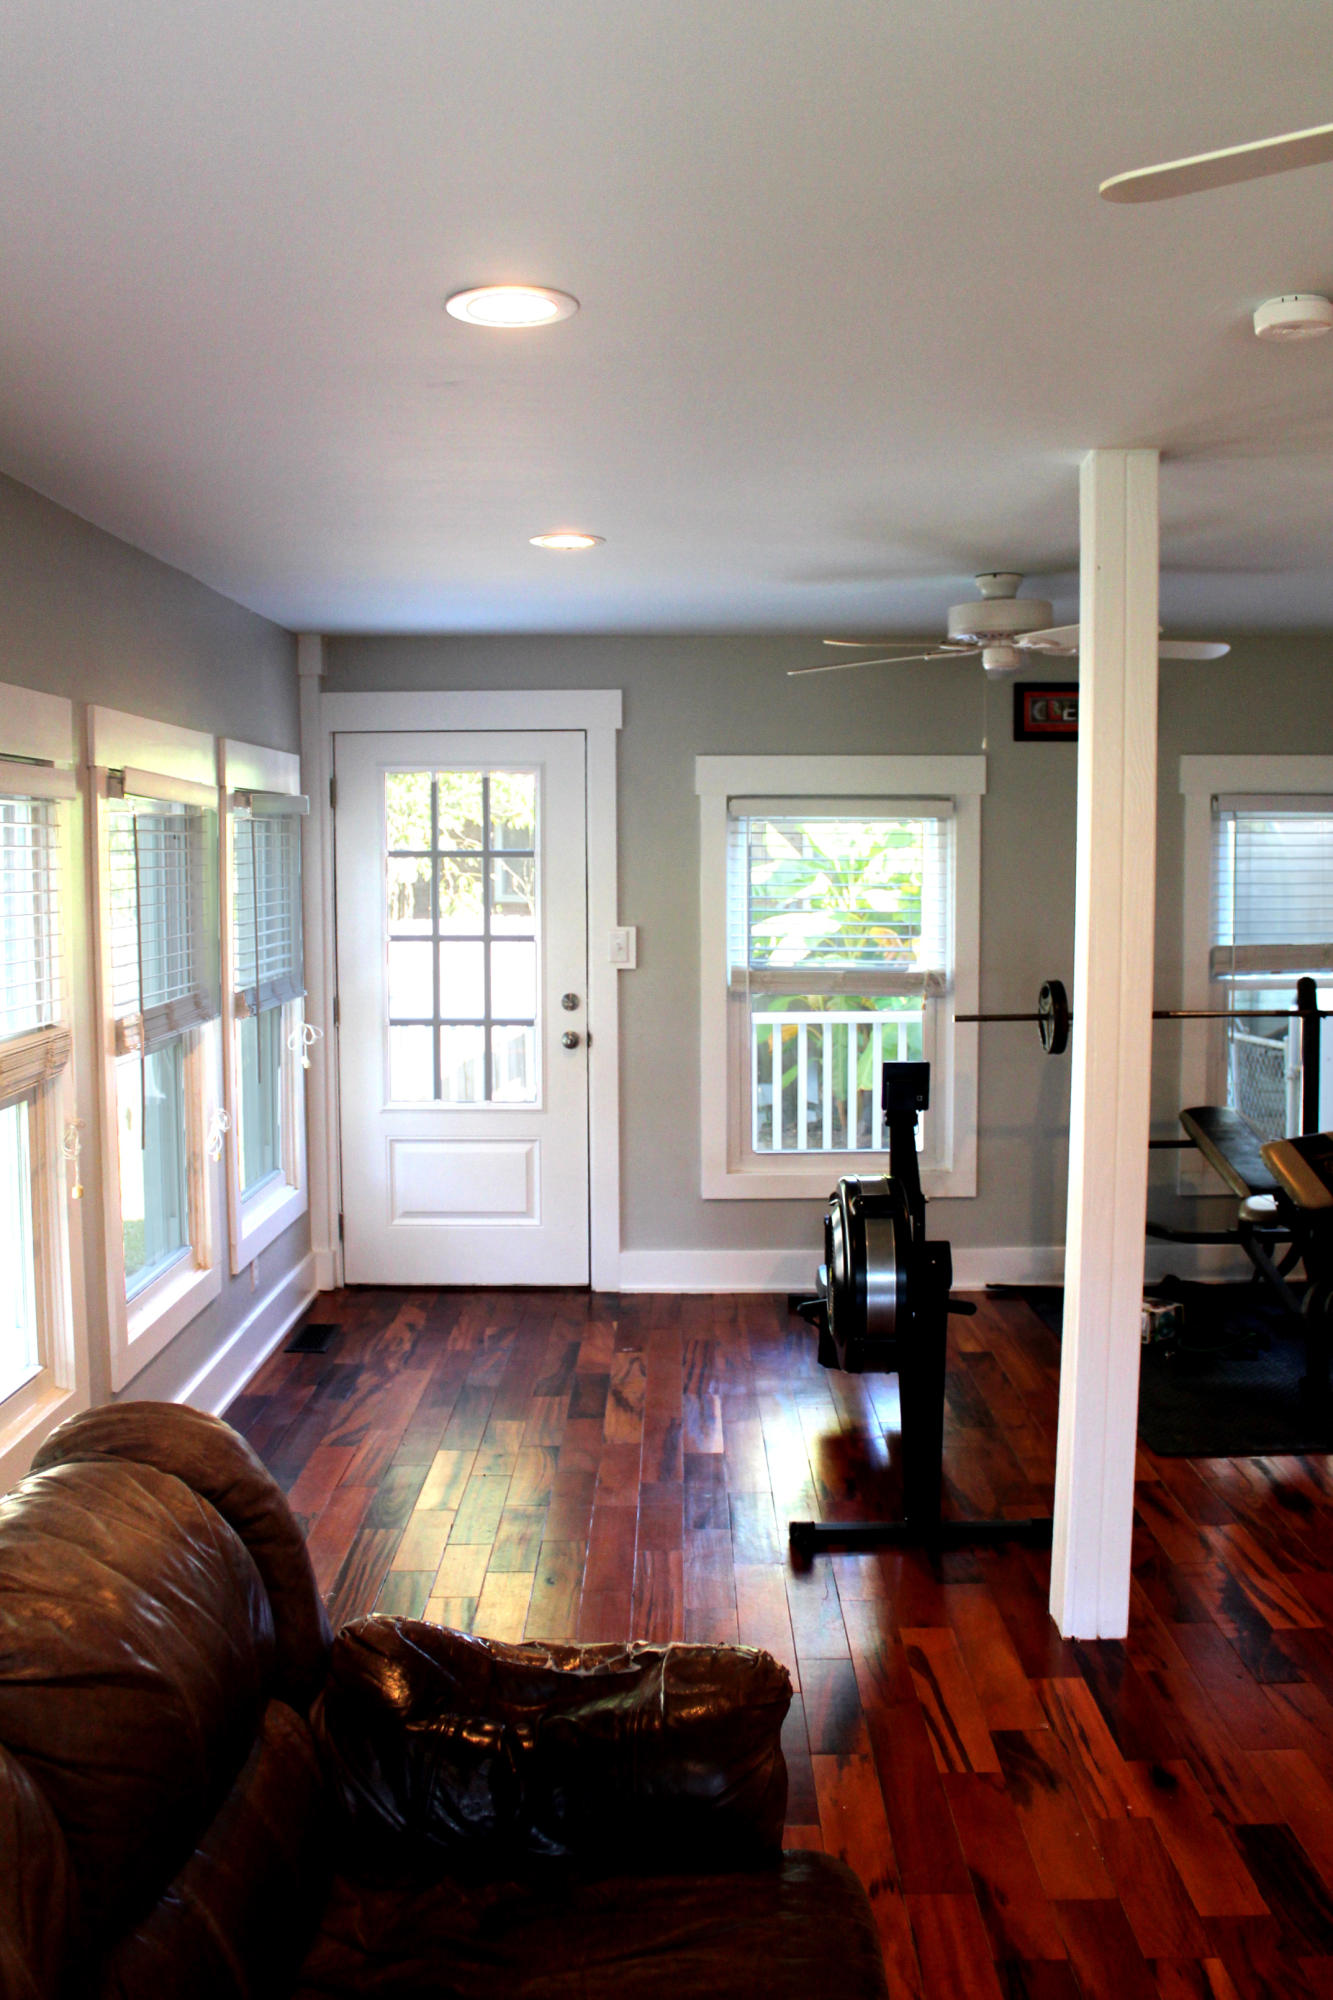 Whitehouse Plantation Homes For Sale - 1356 Whitehouse, Charleston, SC - 1